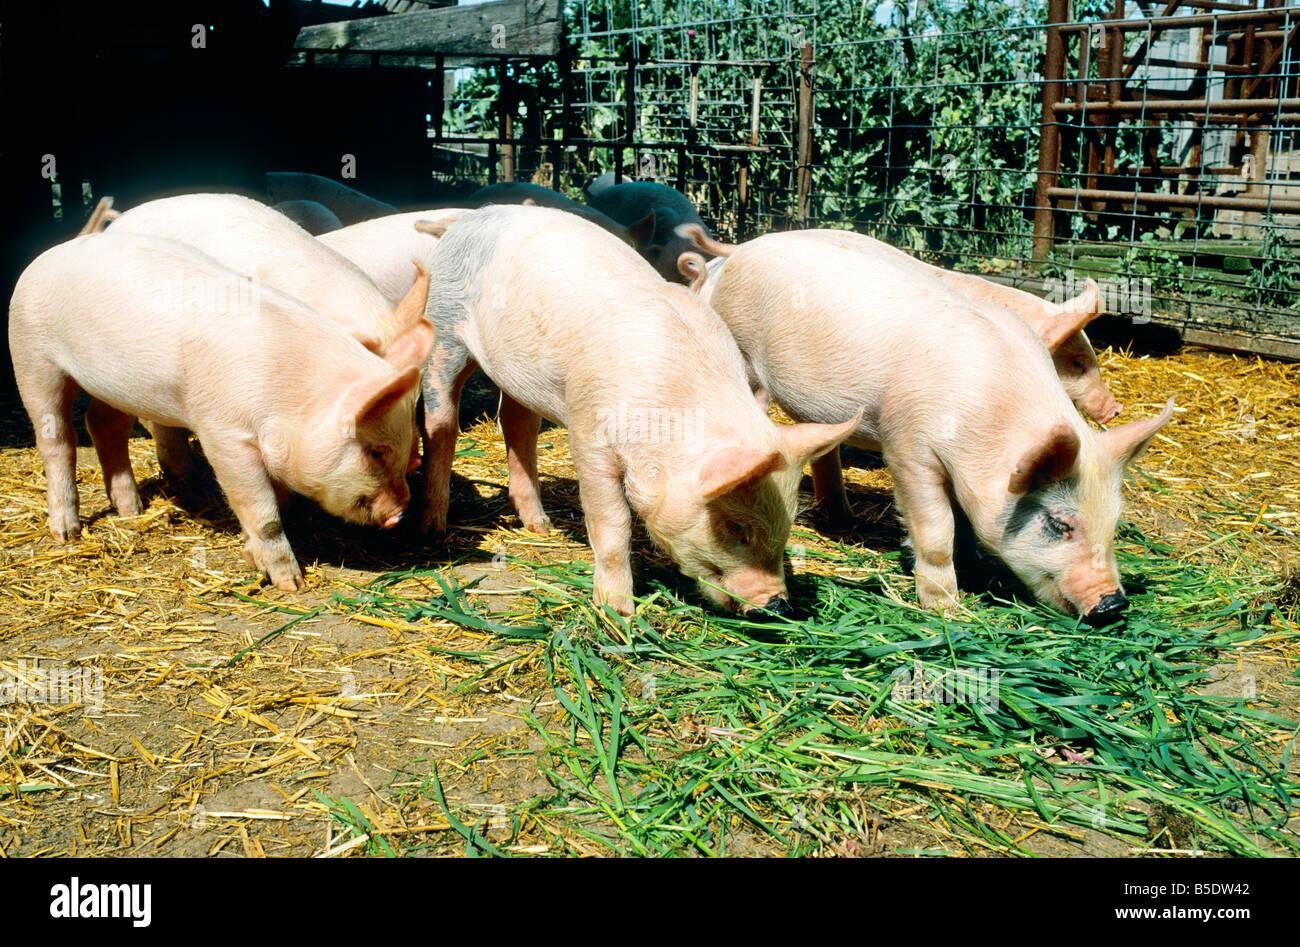 Juvenile hogs feeding in pen. - Stock Image